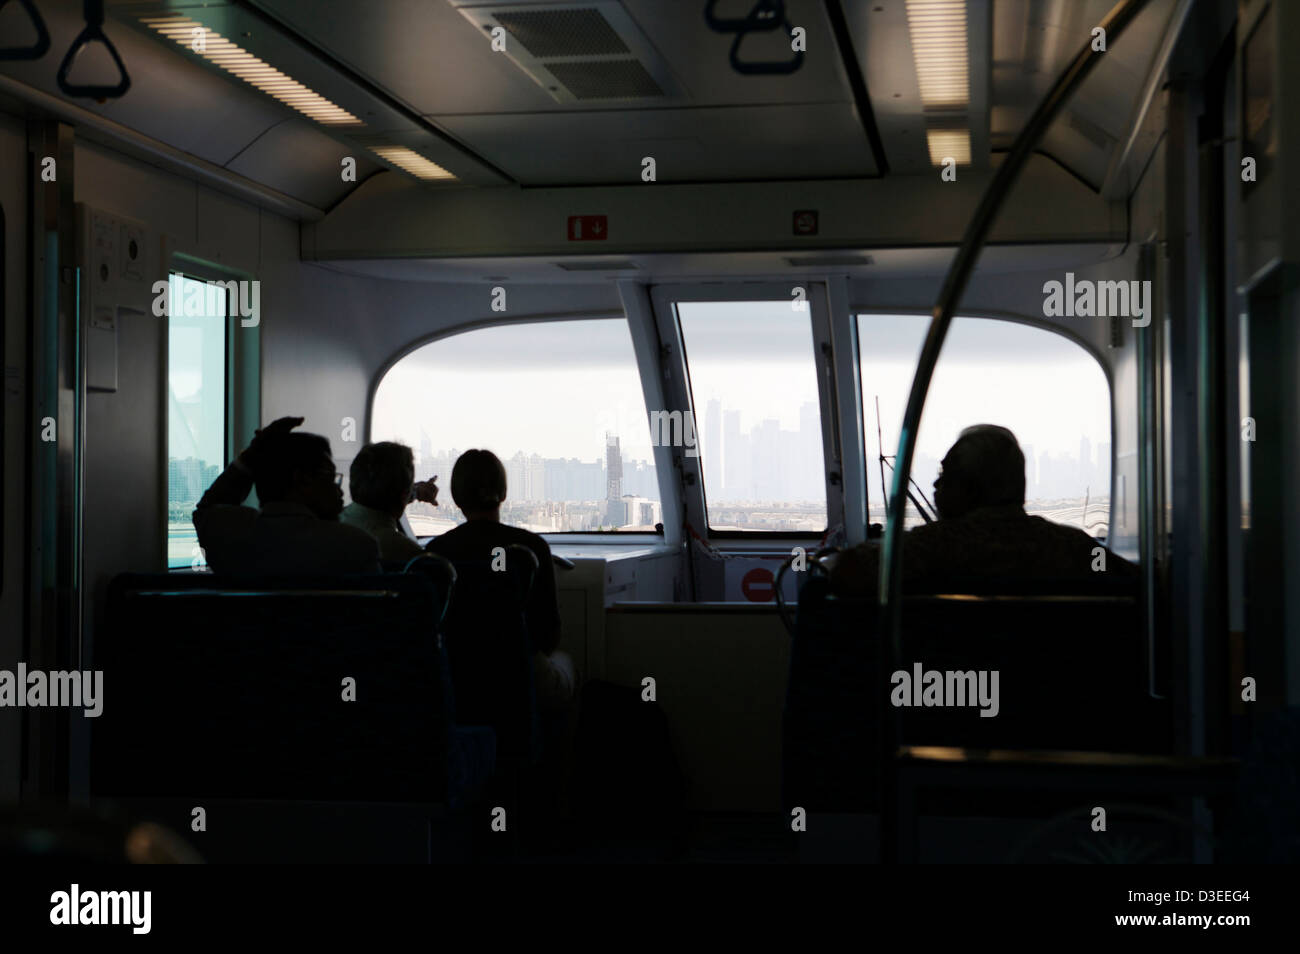 Four passengers on the monorail to the Atlantis Palm hotel in Dubai, UAE - Stock Image